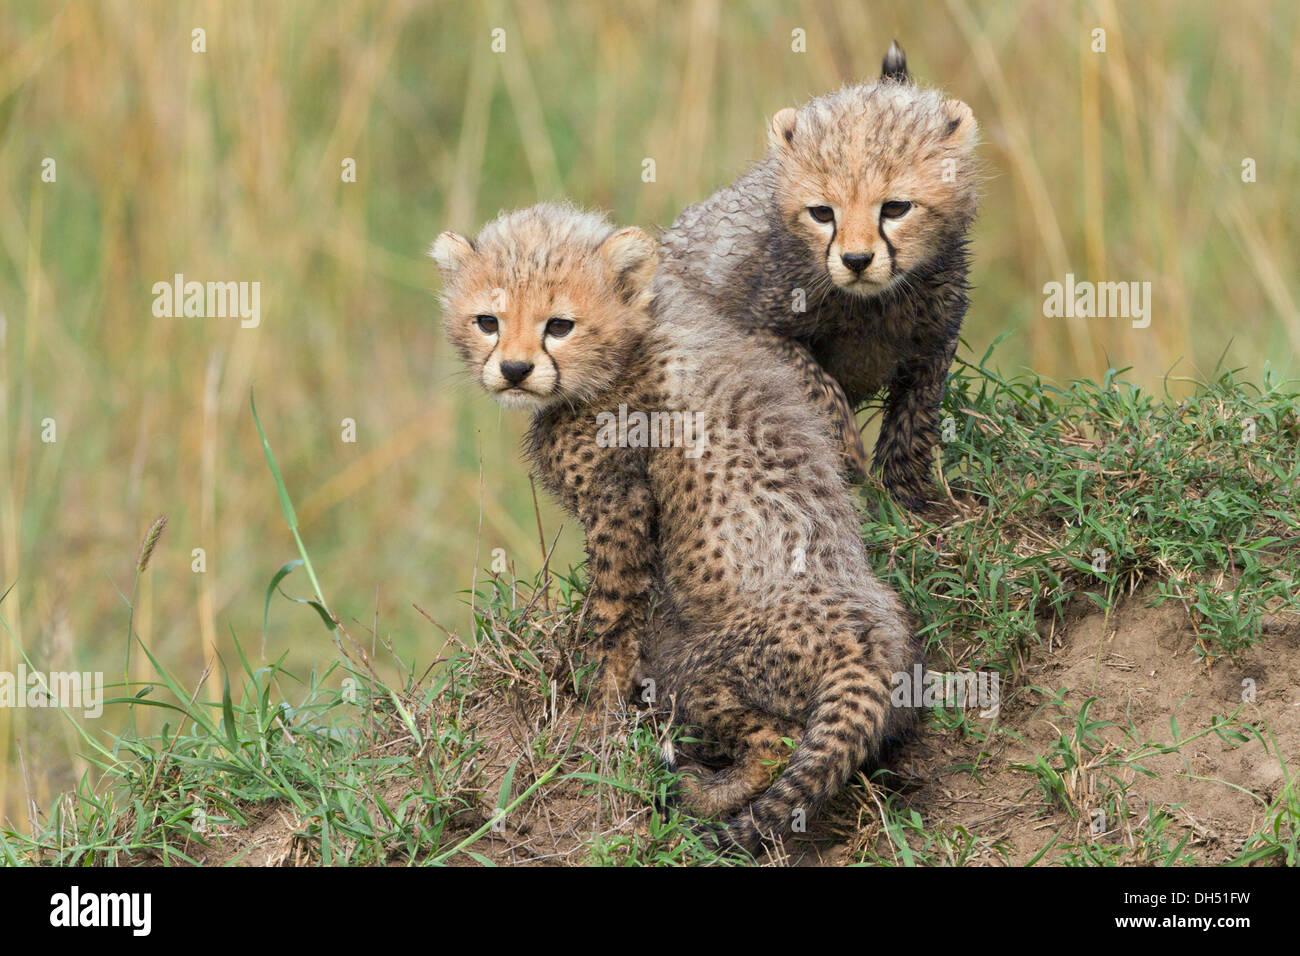 Cheetahs (Acinonyx jubatus), cubs, several weeks, Massai Mara, Serengeti, Rift Valley province, Kenya - Stock Image